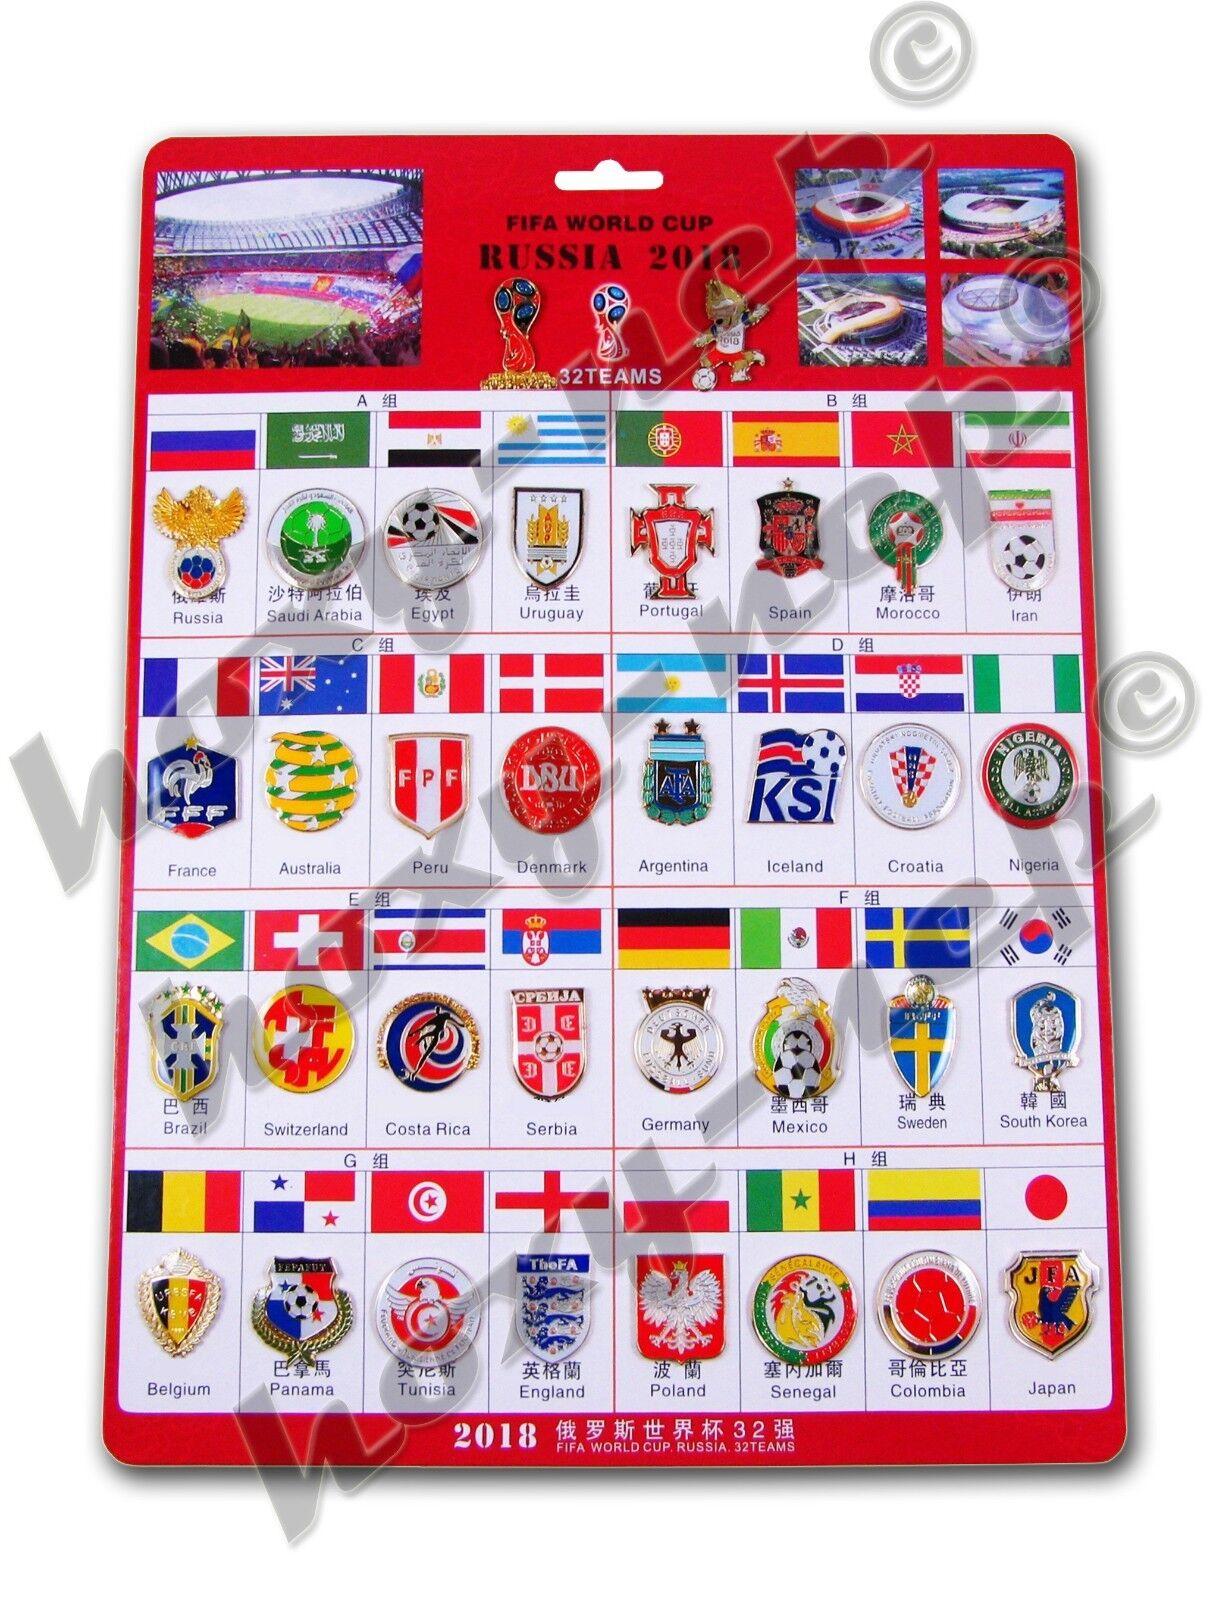 FIFA 2014 WORLD CUP SWITZERLAND FLAG PIN